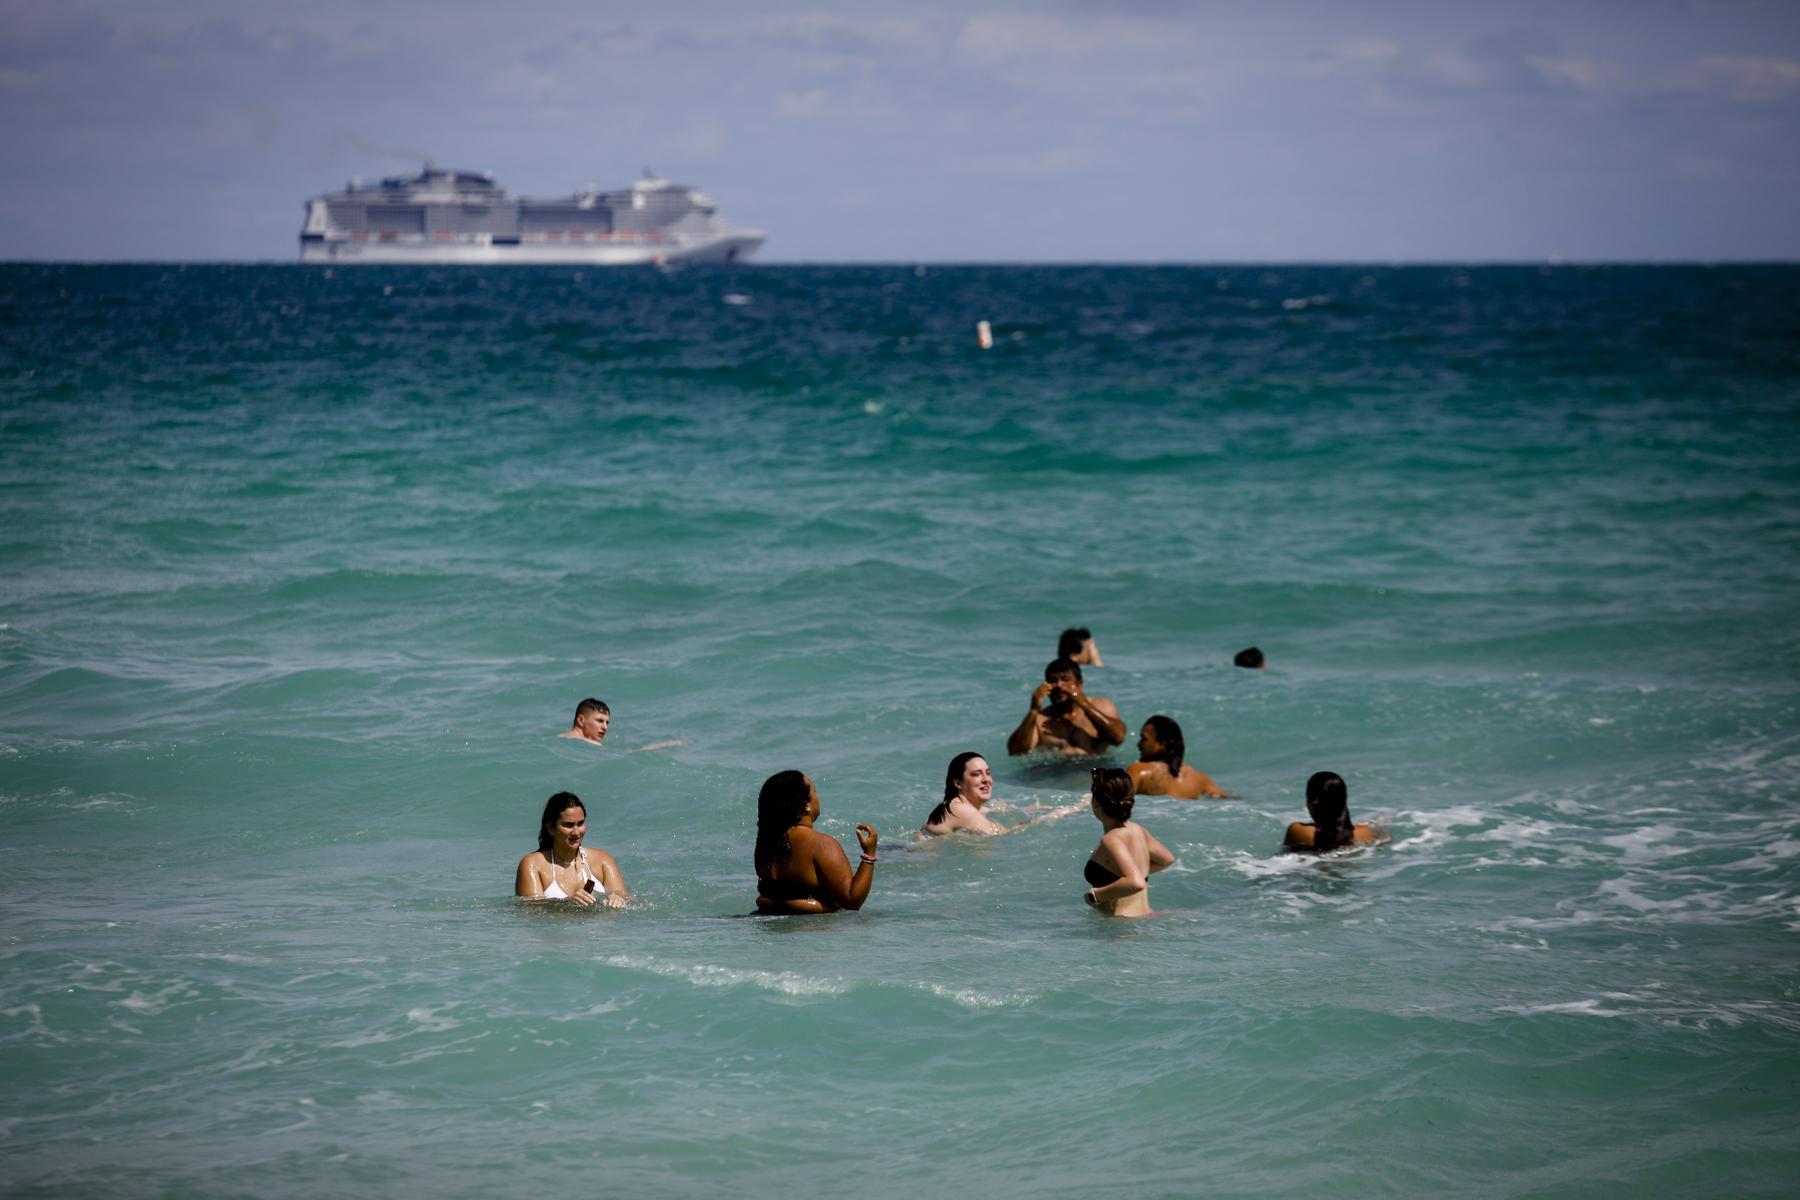 People bath in the beach during Spring Break in Miami Beach, Florida, U.S., on Saturday, March 6, 2021. Photographer: Eva Marie Uzcategui/Bloomberg